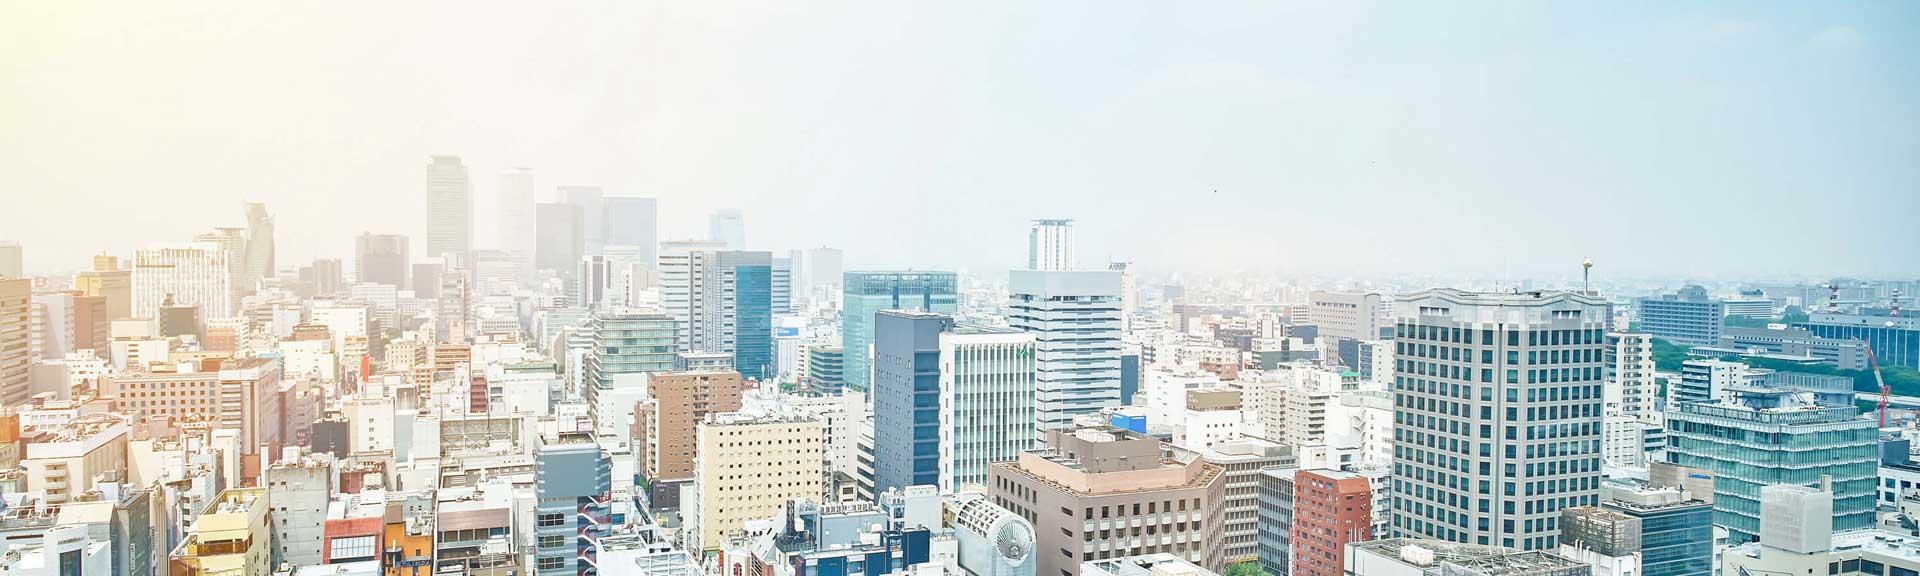 simplebim city